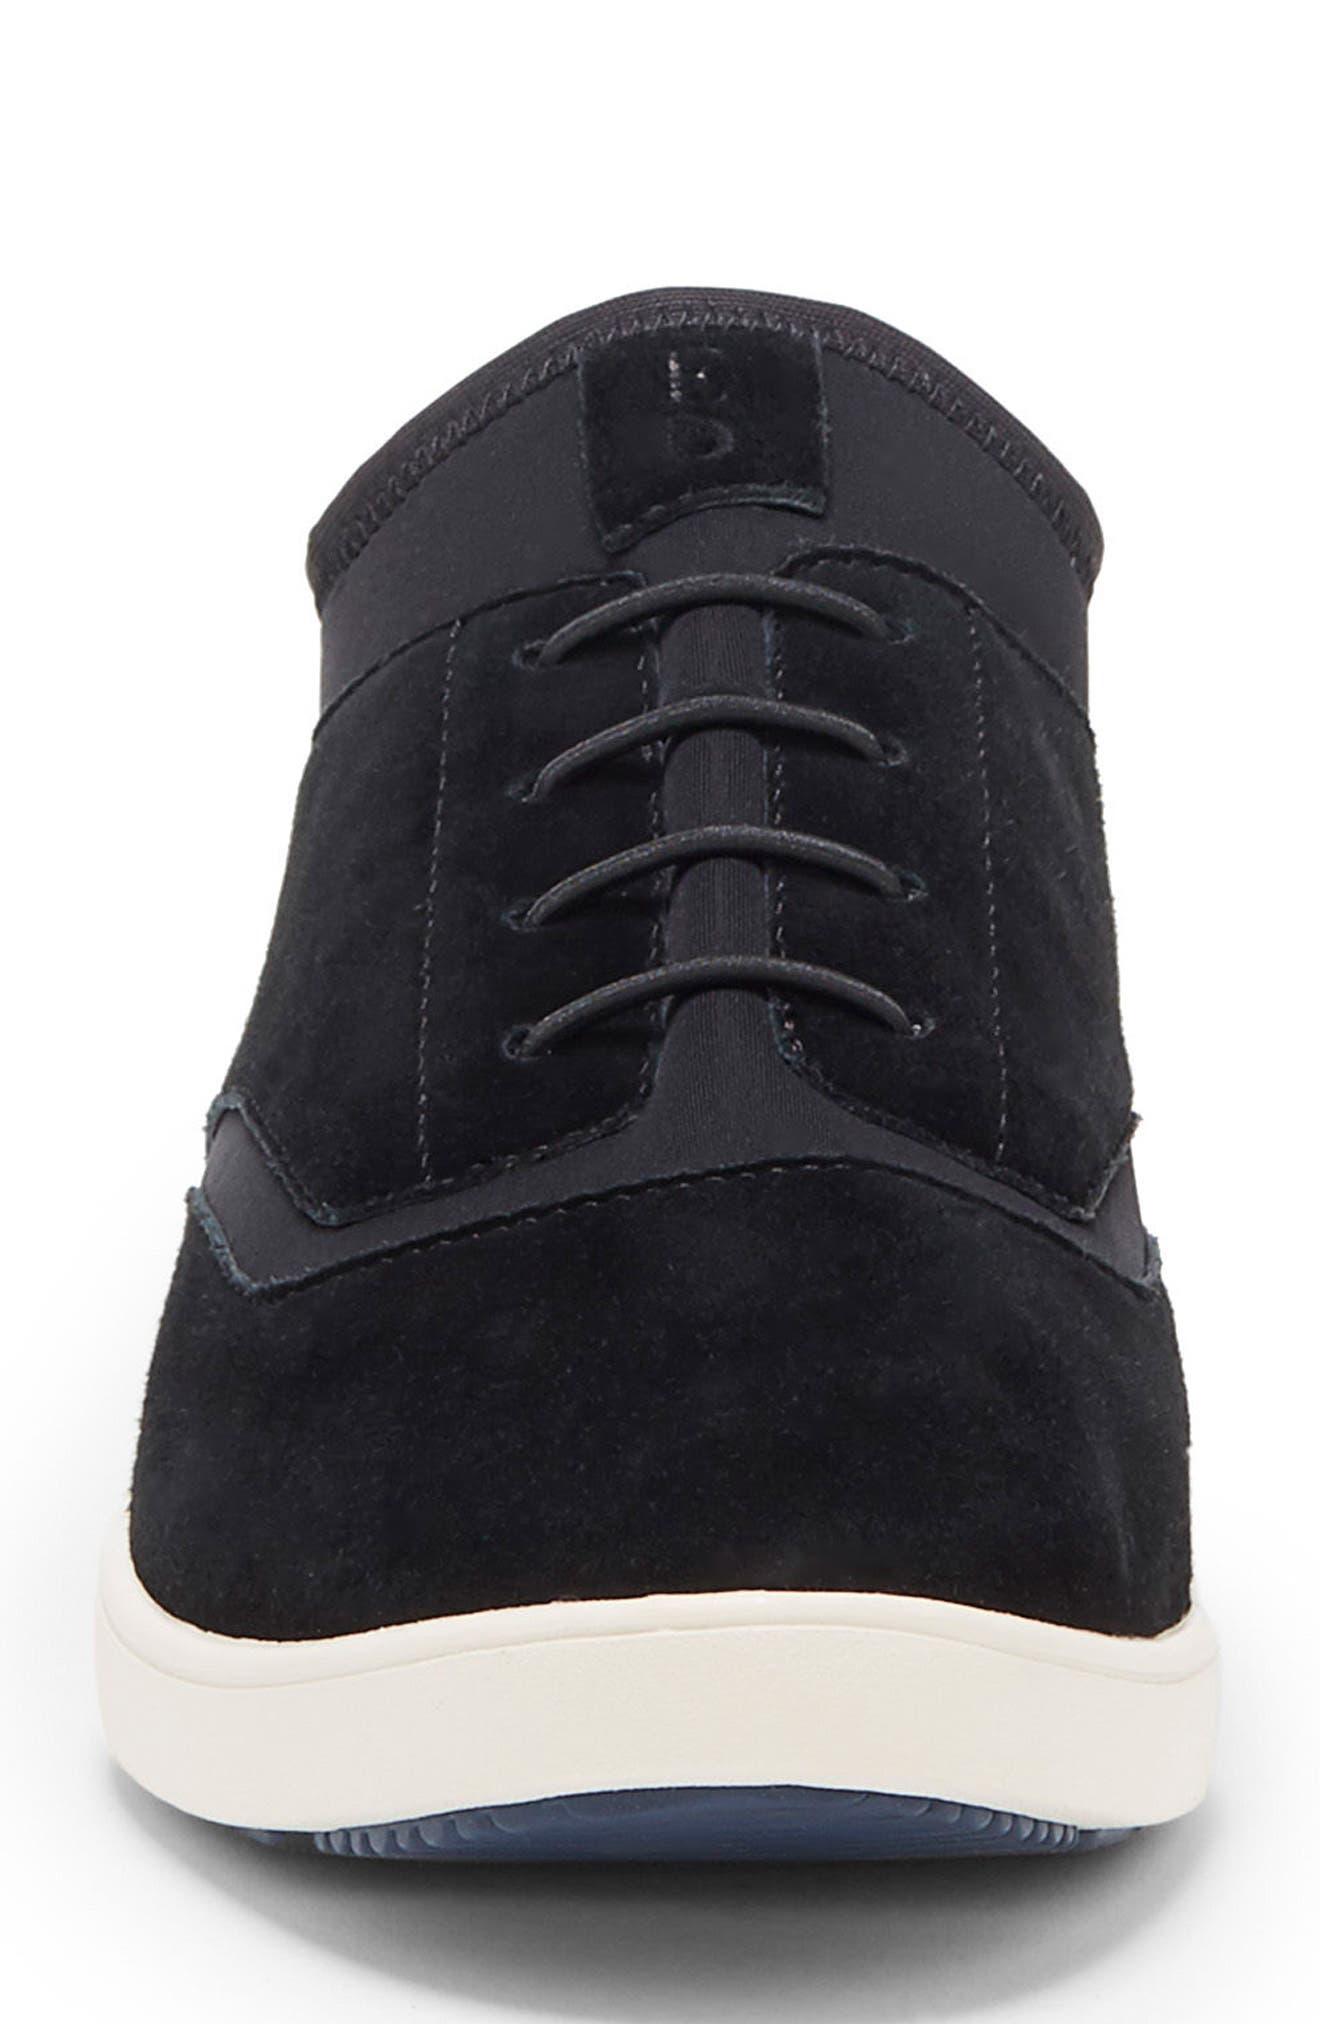 Atala Sneaker,                             Alternate thumbnail 3, color,                             002